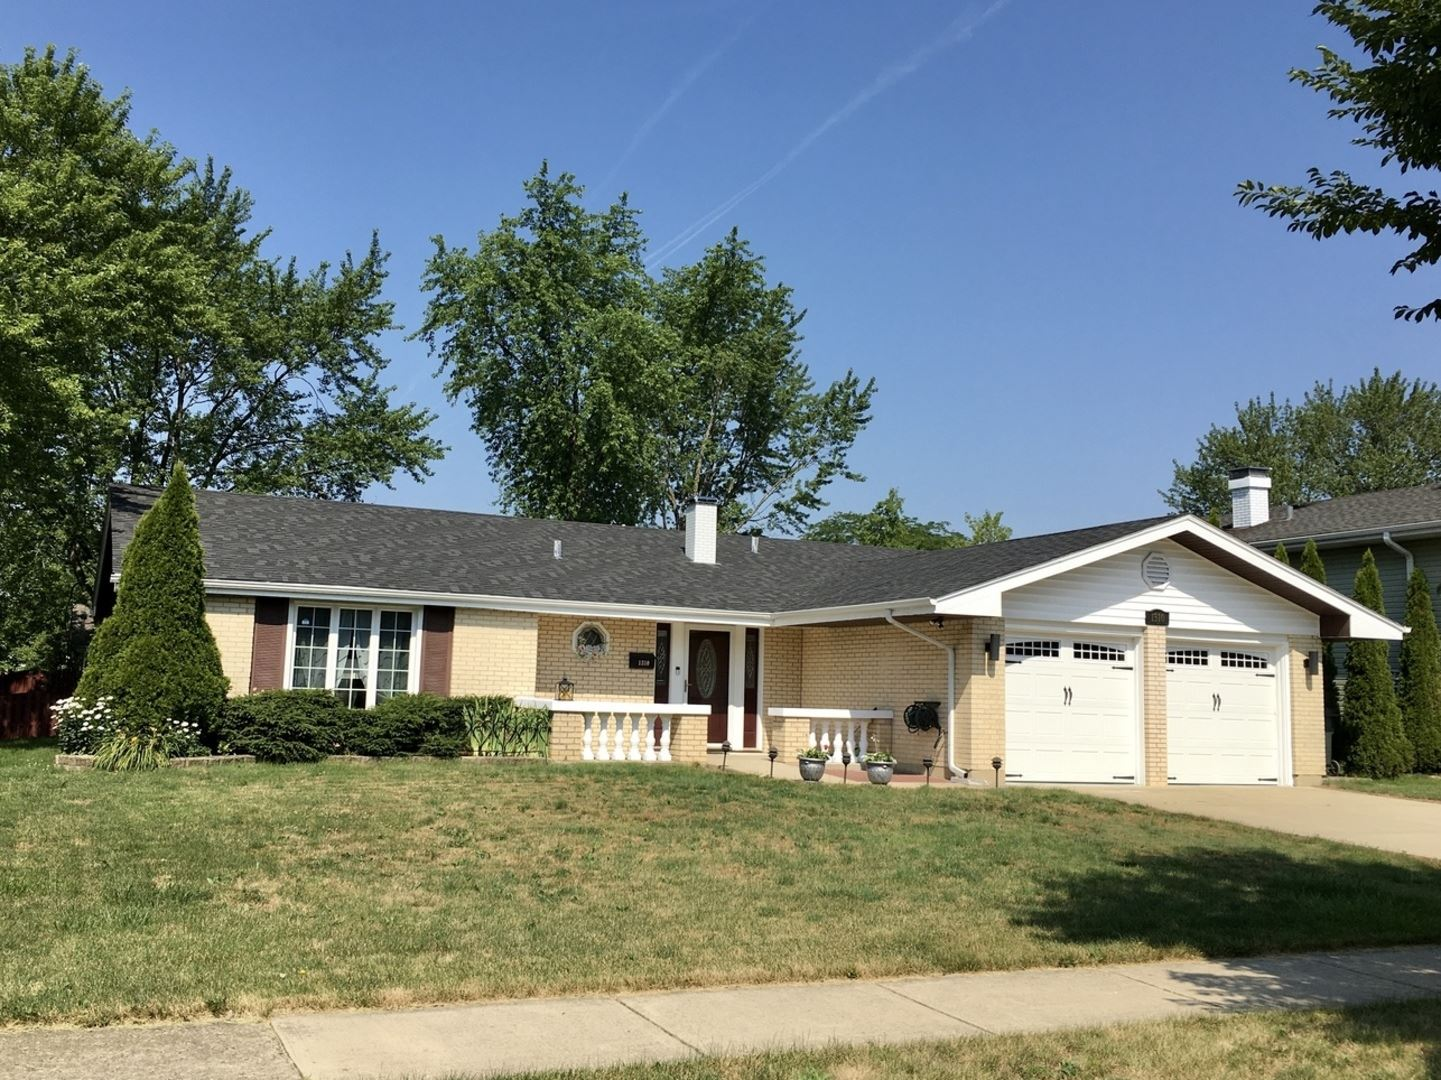 1310 Meyer Road, Hoffman Estates, IL 60169 - #: 10773855